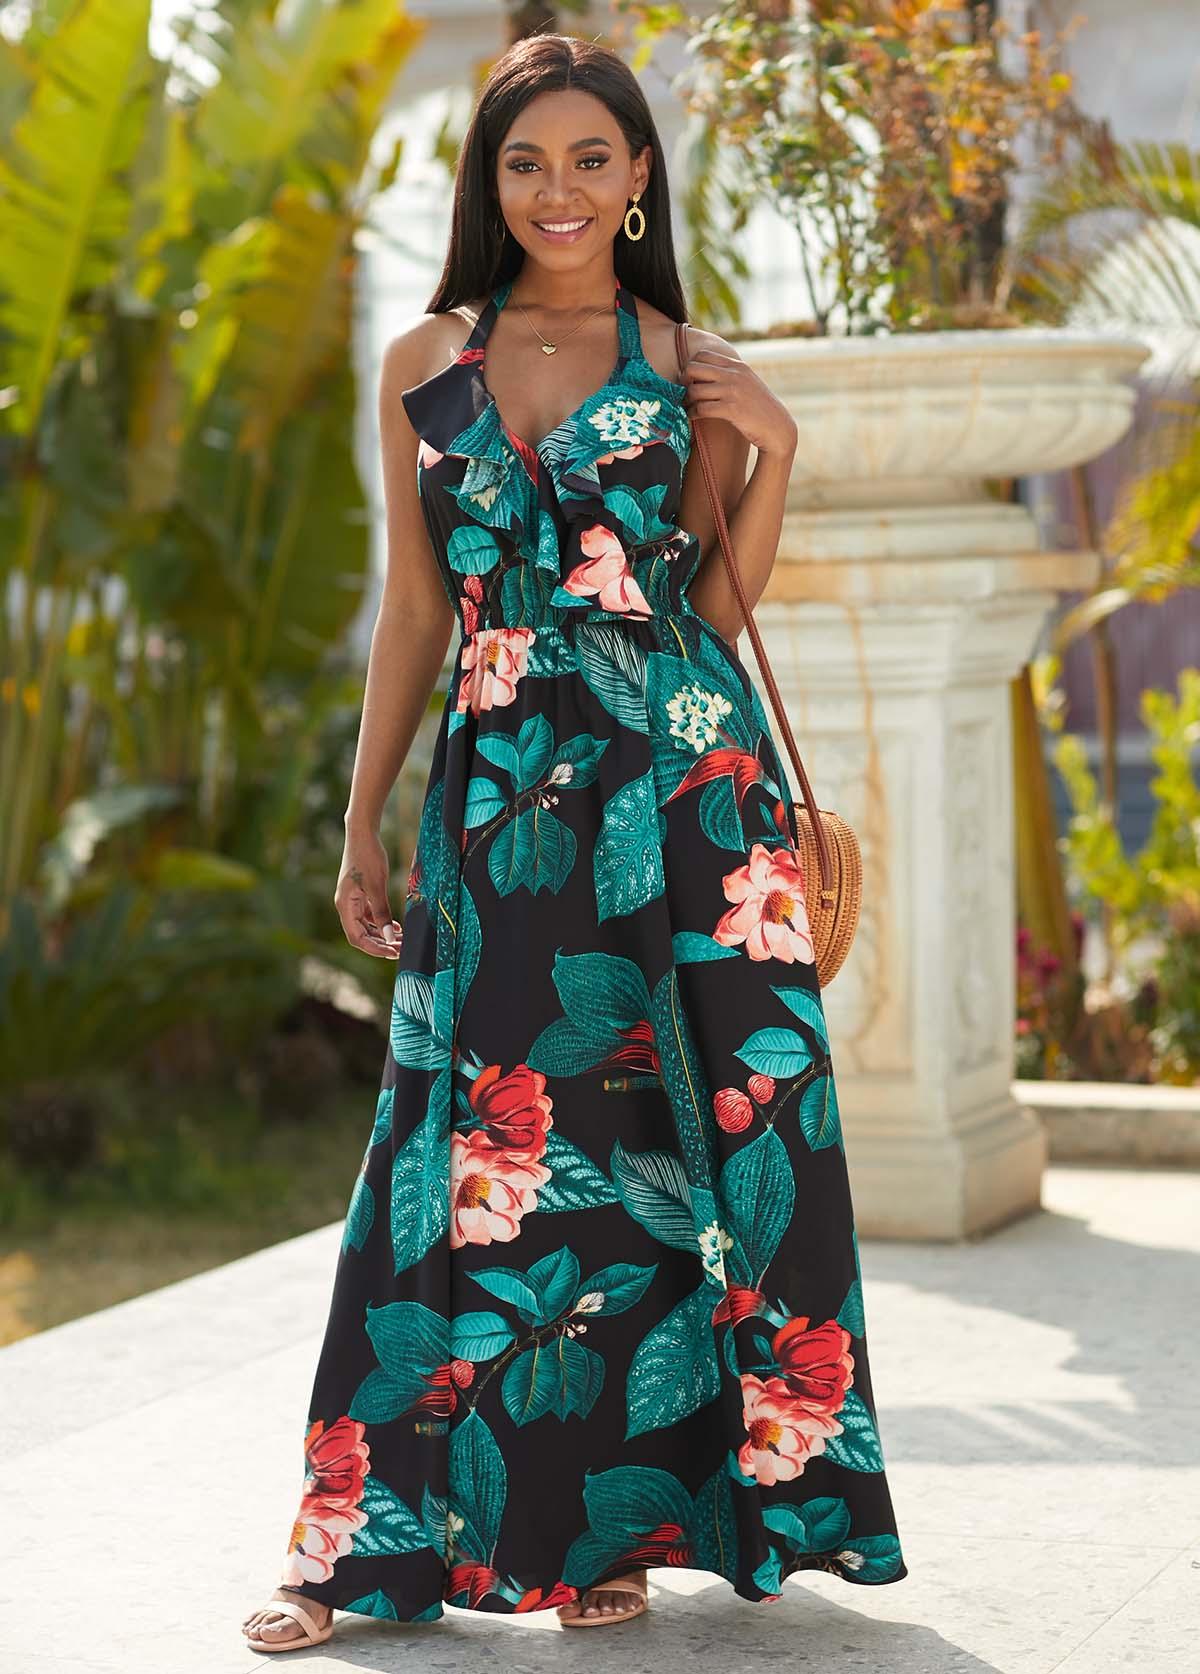 ROTITA Halter Floral Print Flounce Maxi Dress